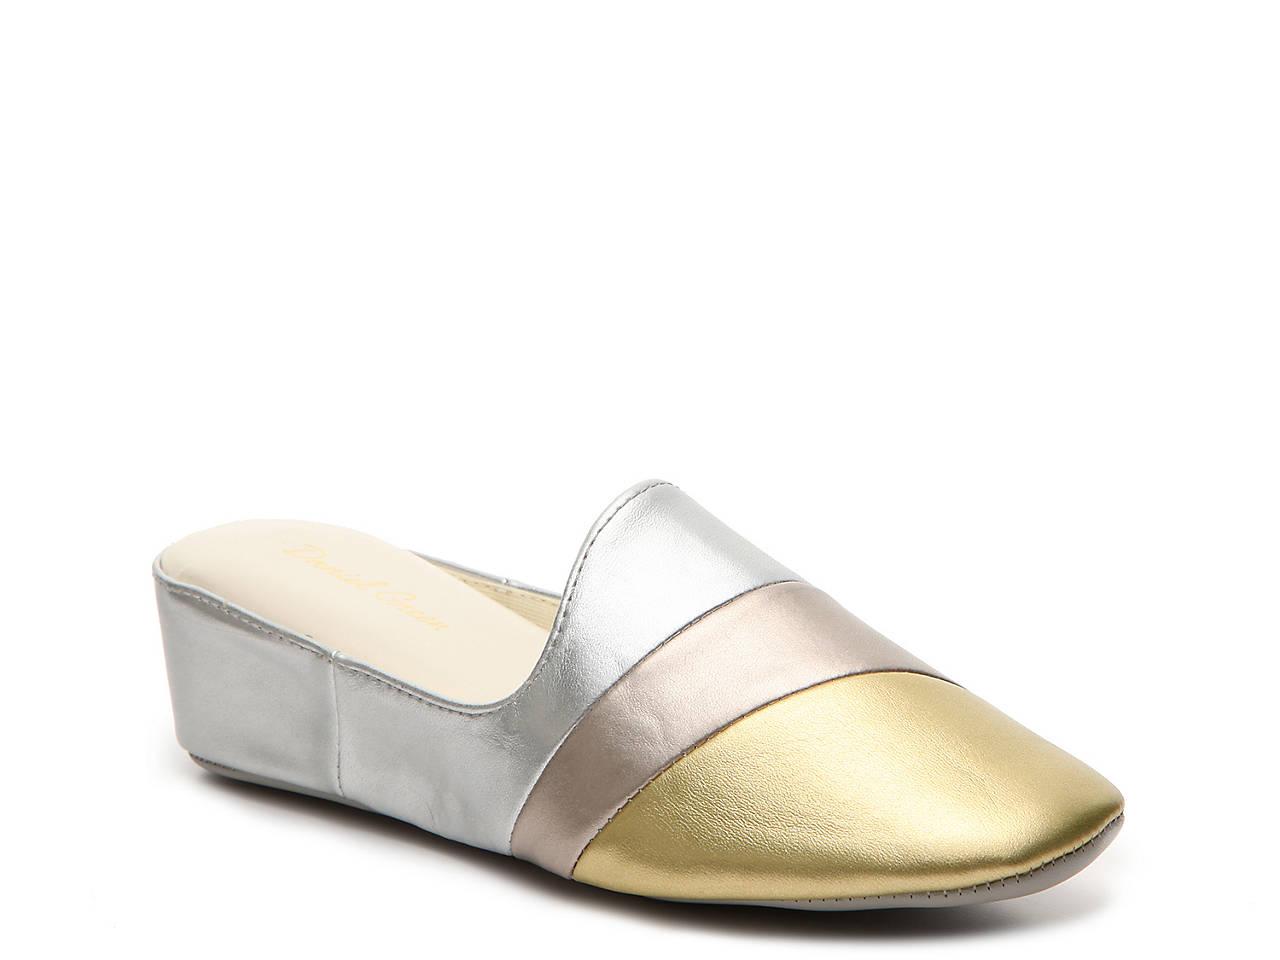 c3b60f43c0bf Daniel Green Shoes